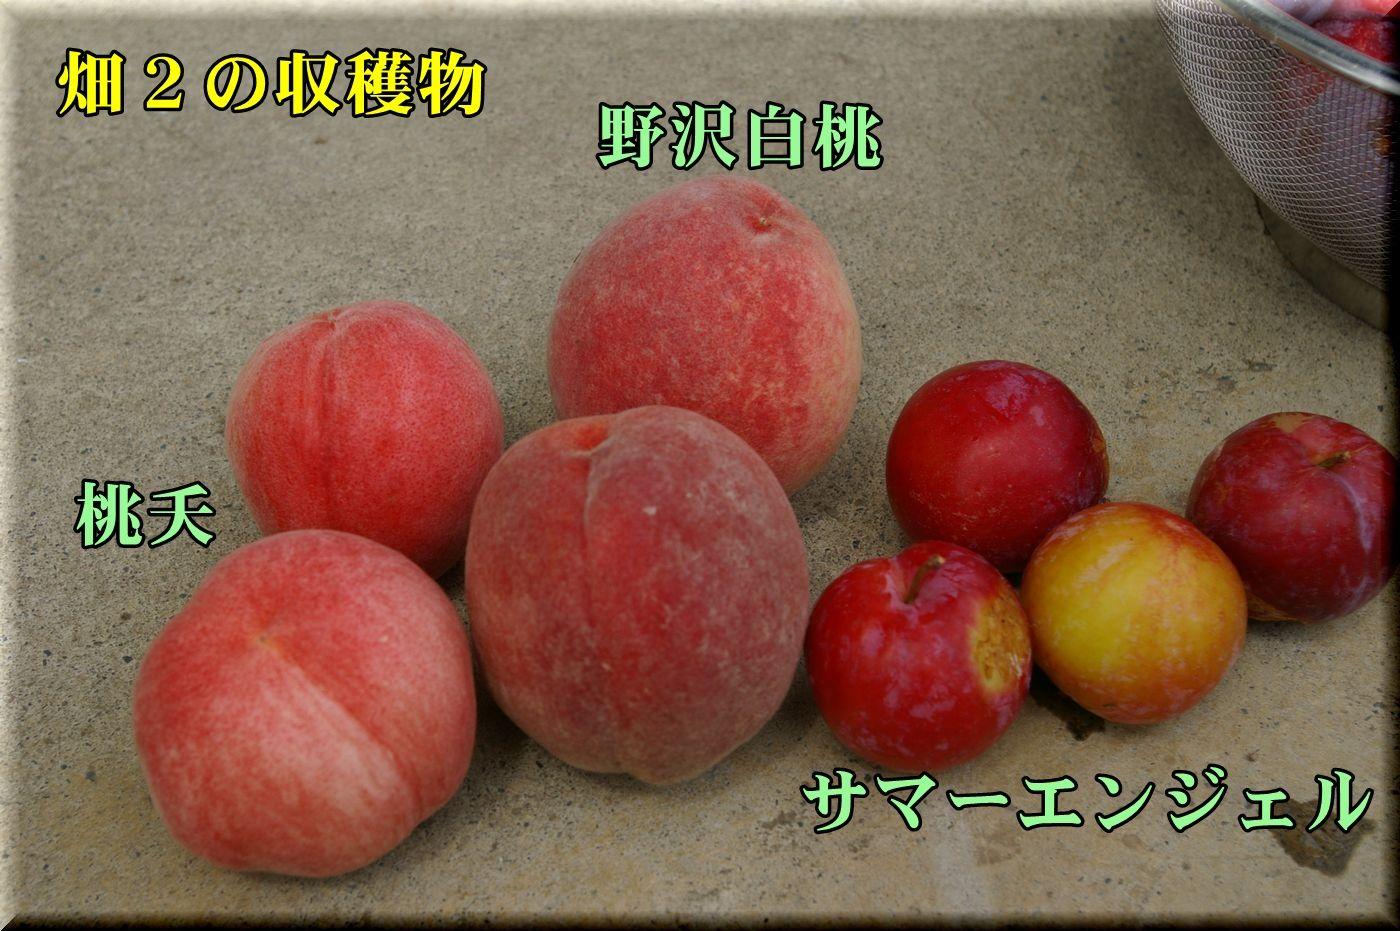 1nozawa_touyou160710_027.jpg